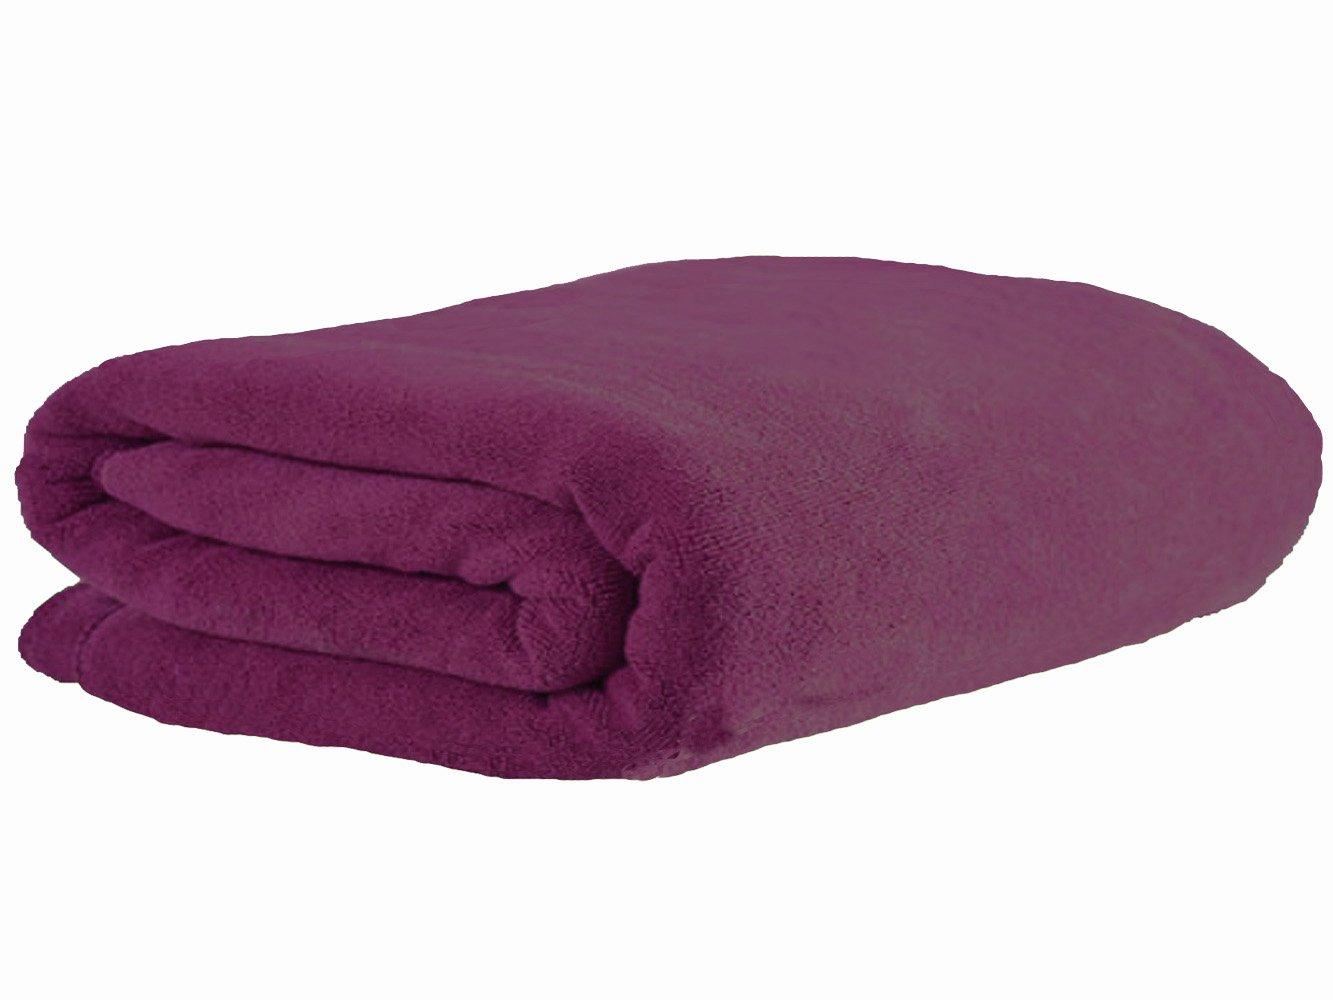 Simplife Microfiber Luxury Bath Sheet Extra Large Bath Towel Fast Drying Beach Towel (36 Inch X 72 Inch, Purple) COMIN18JU061723